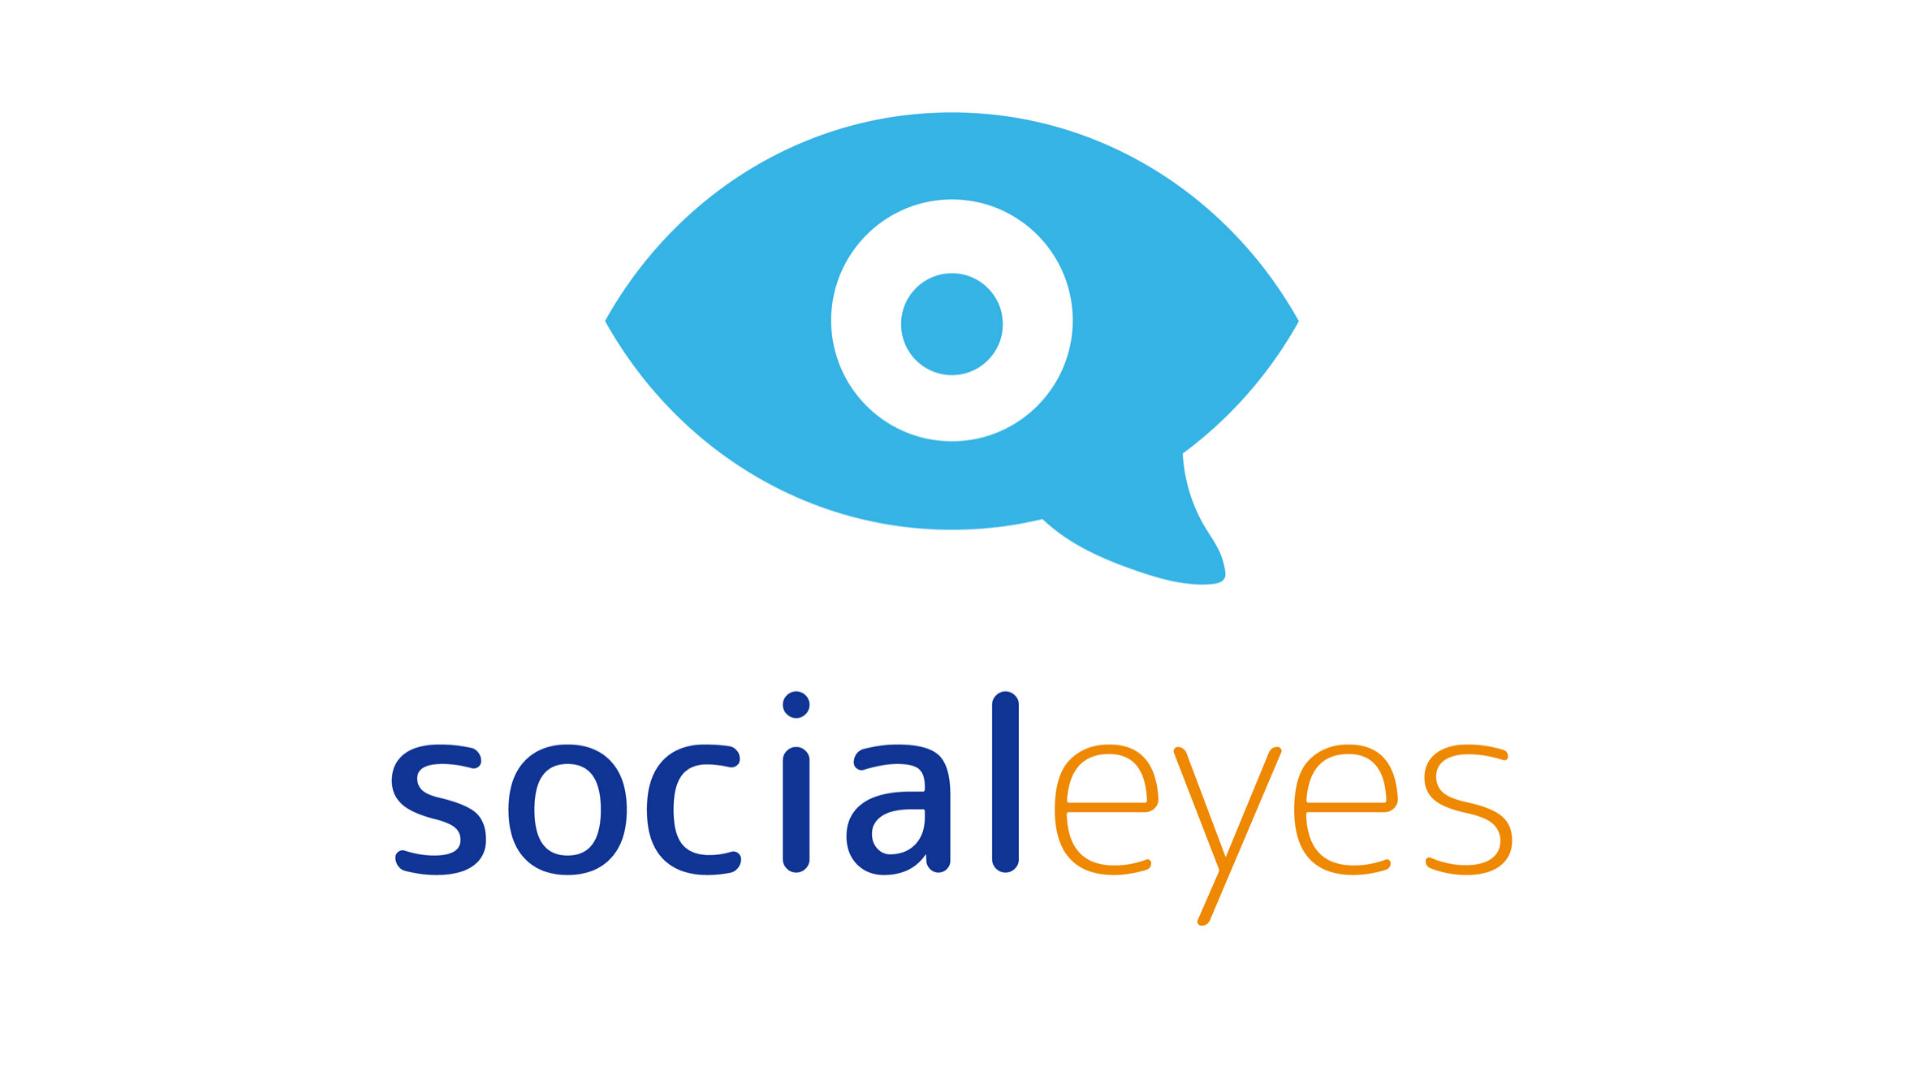 socialeyes logo